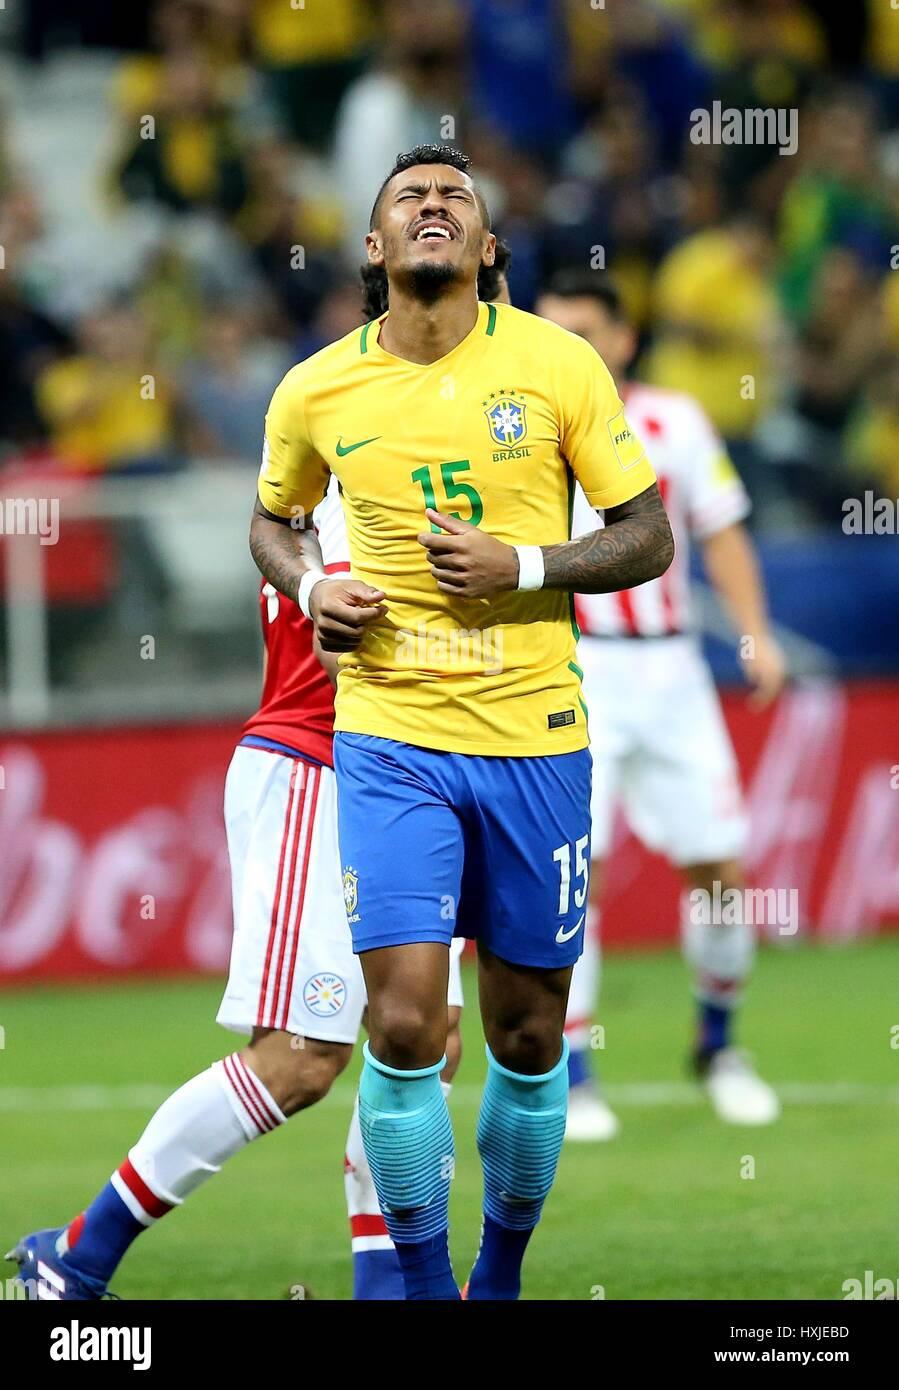 Sao Paulo Brazil 28th Mar 2017 Paulinho of Brazil reacts